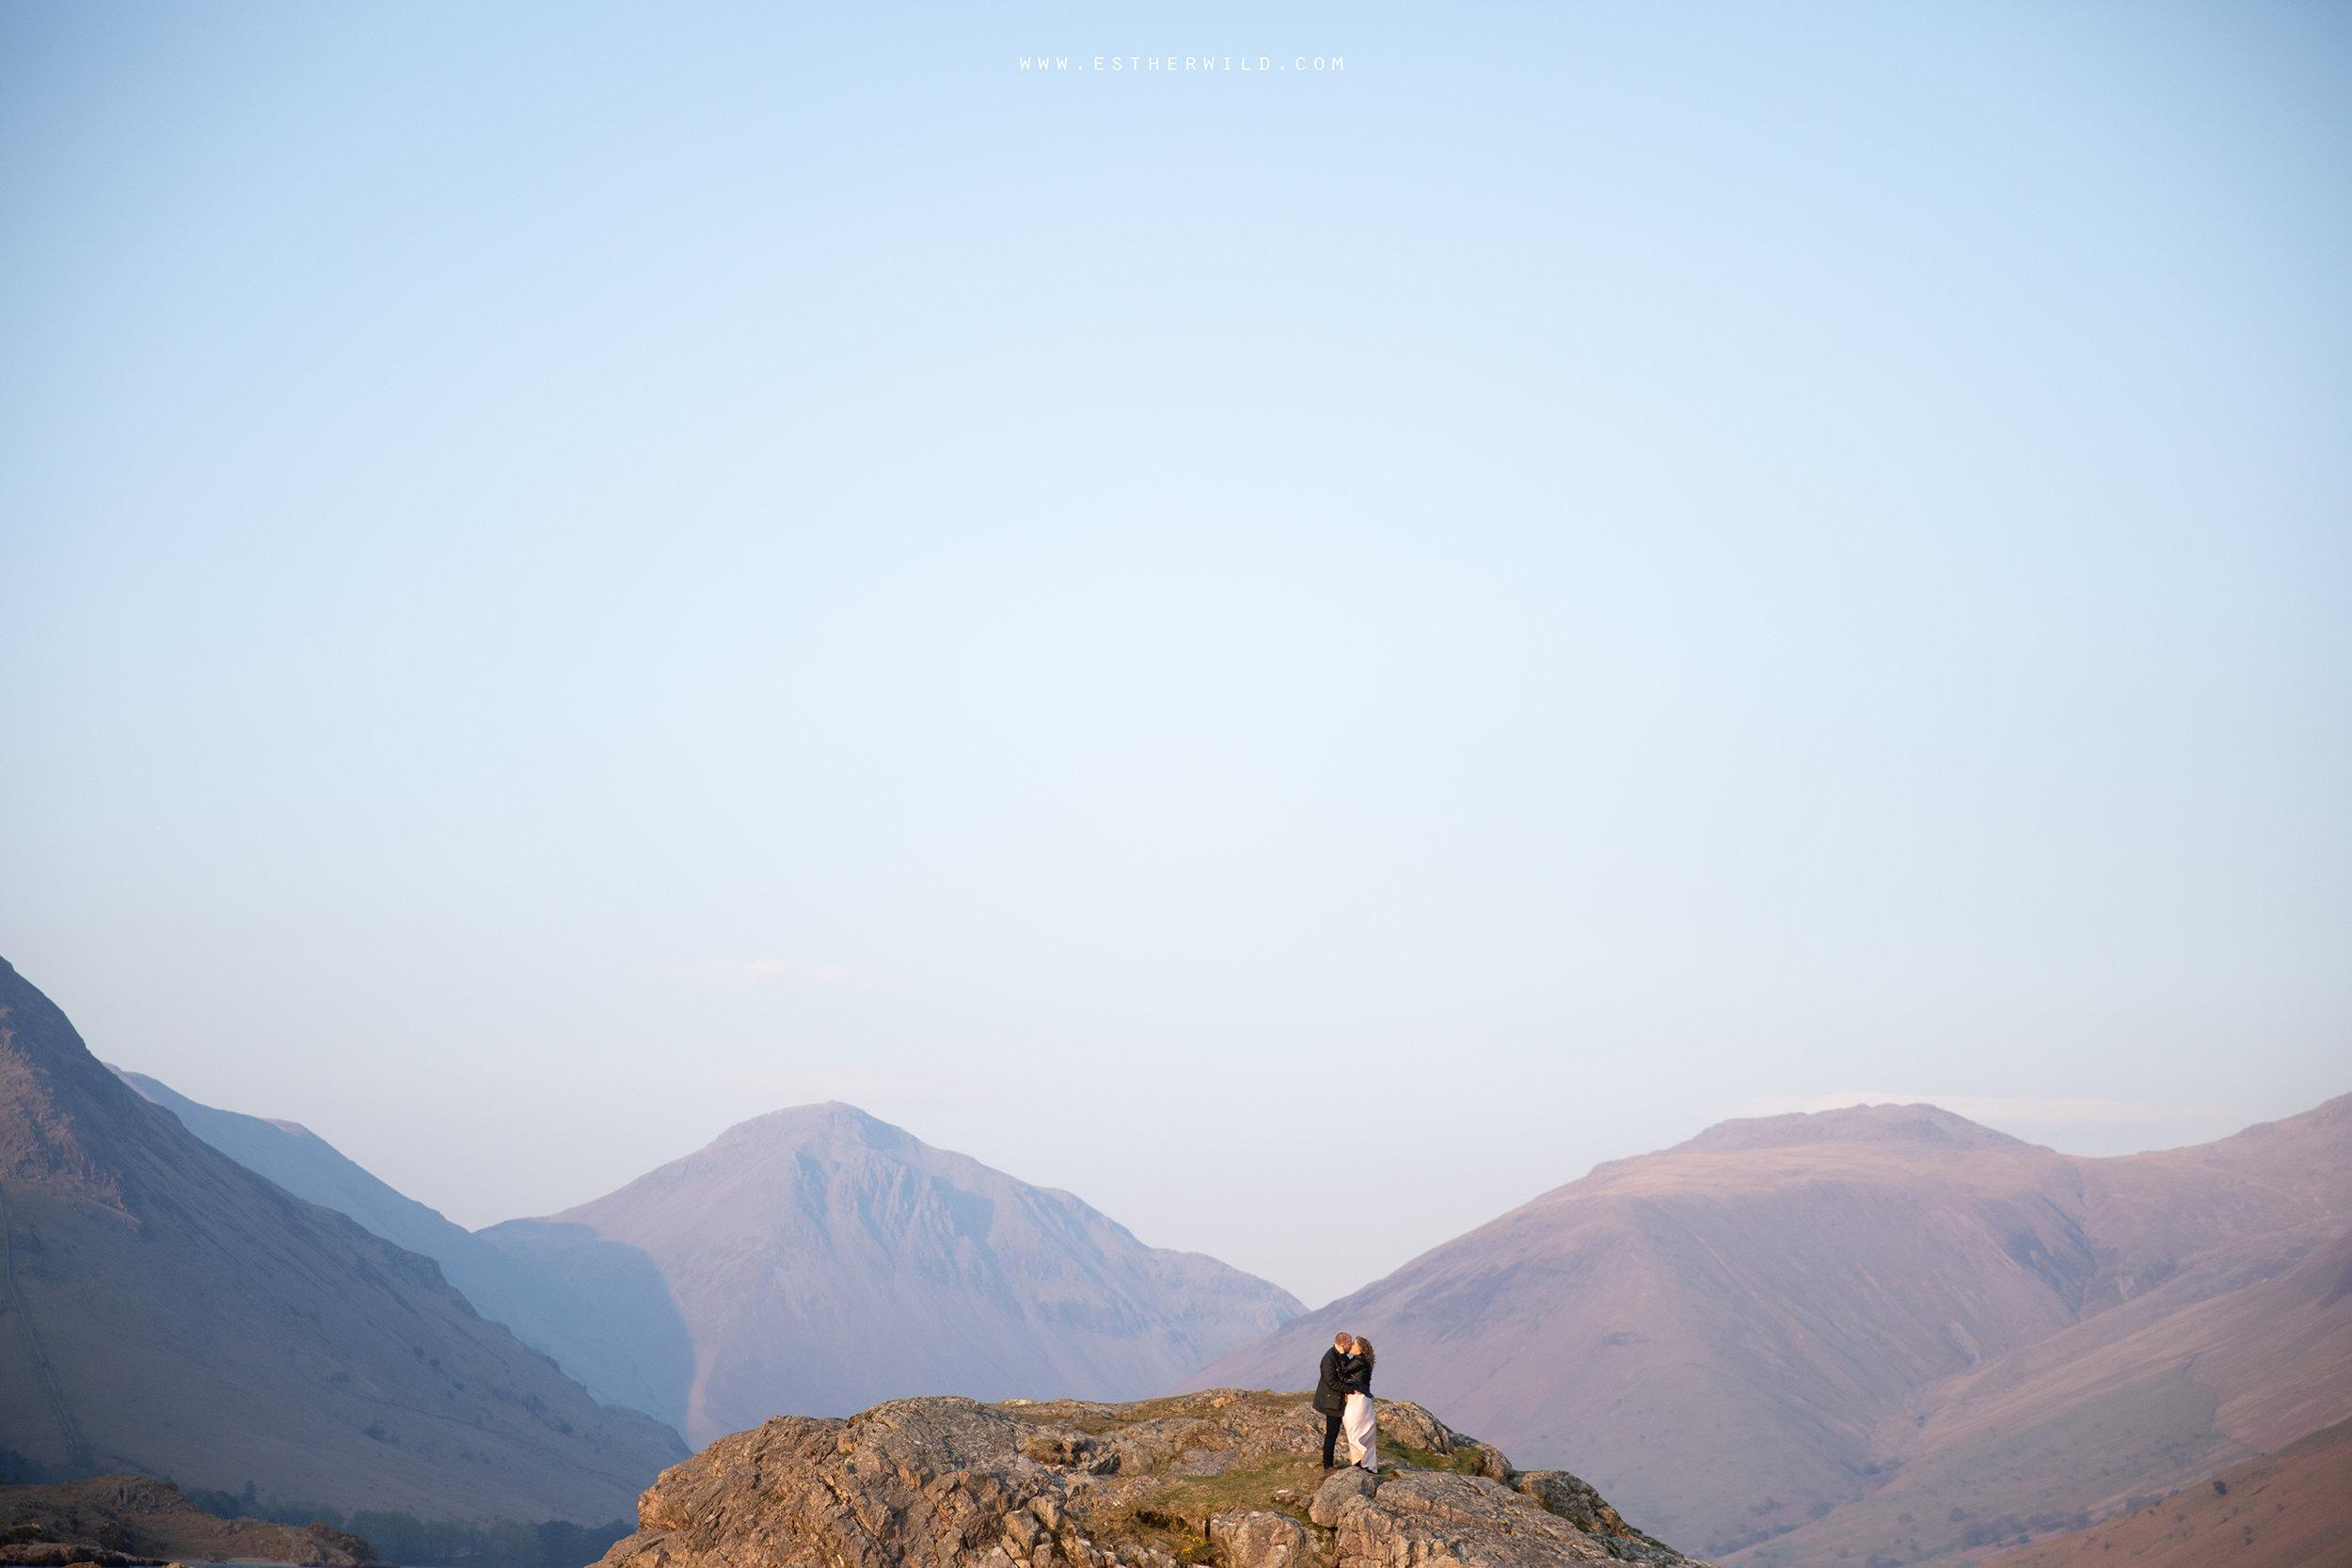 Cumbria_Lake_District_Wasdale_Wedding_Photographer_Destination_Engagement_Anniversary_Esther_Wild_IMG_4577.jpg